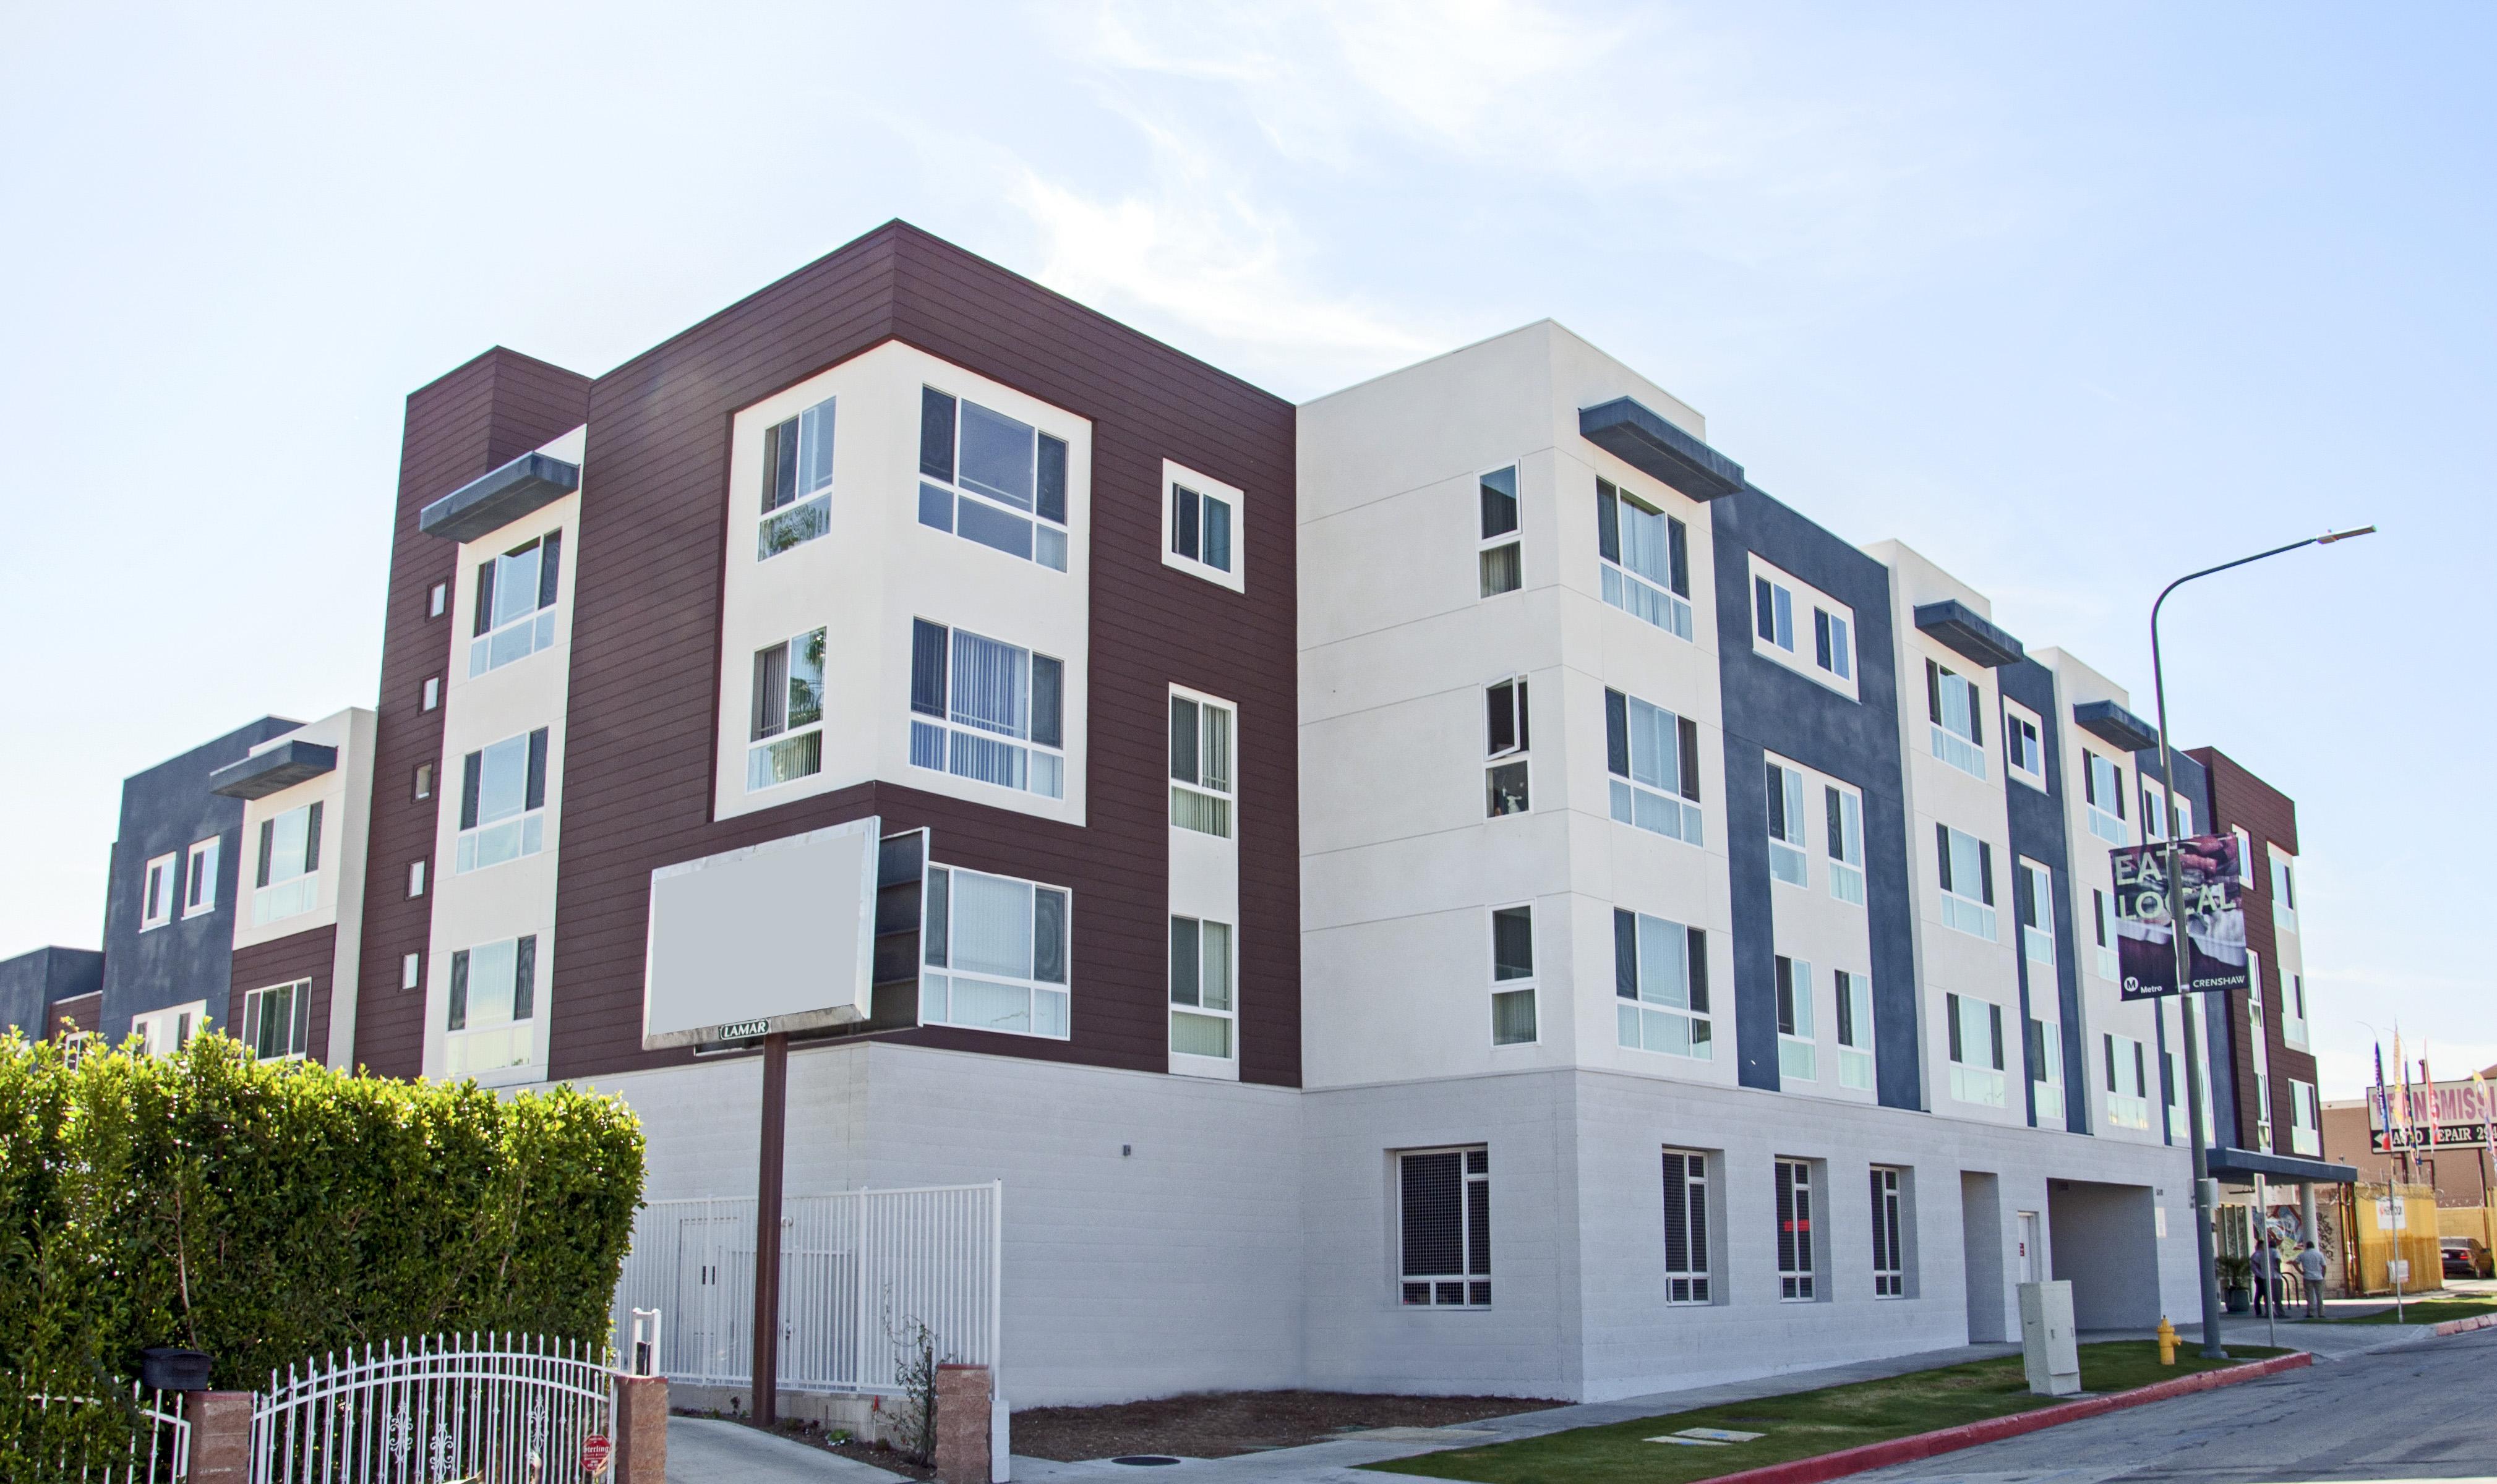 Crenshaw Family Apartments 5110 Blvd Los Angeles Ca